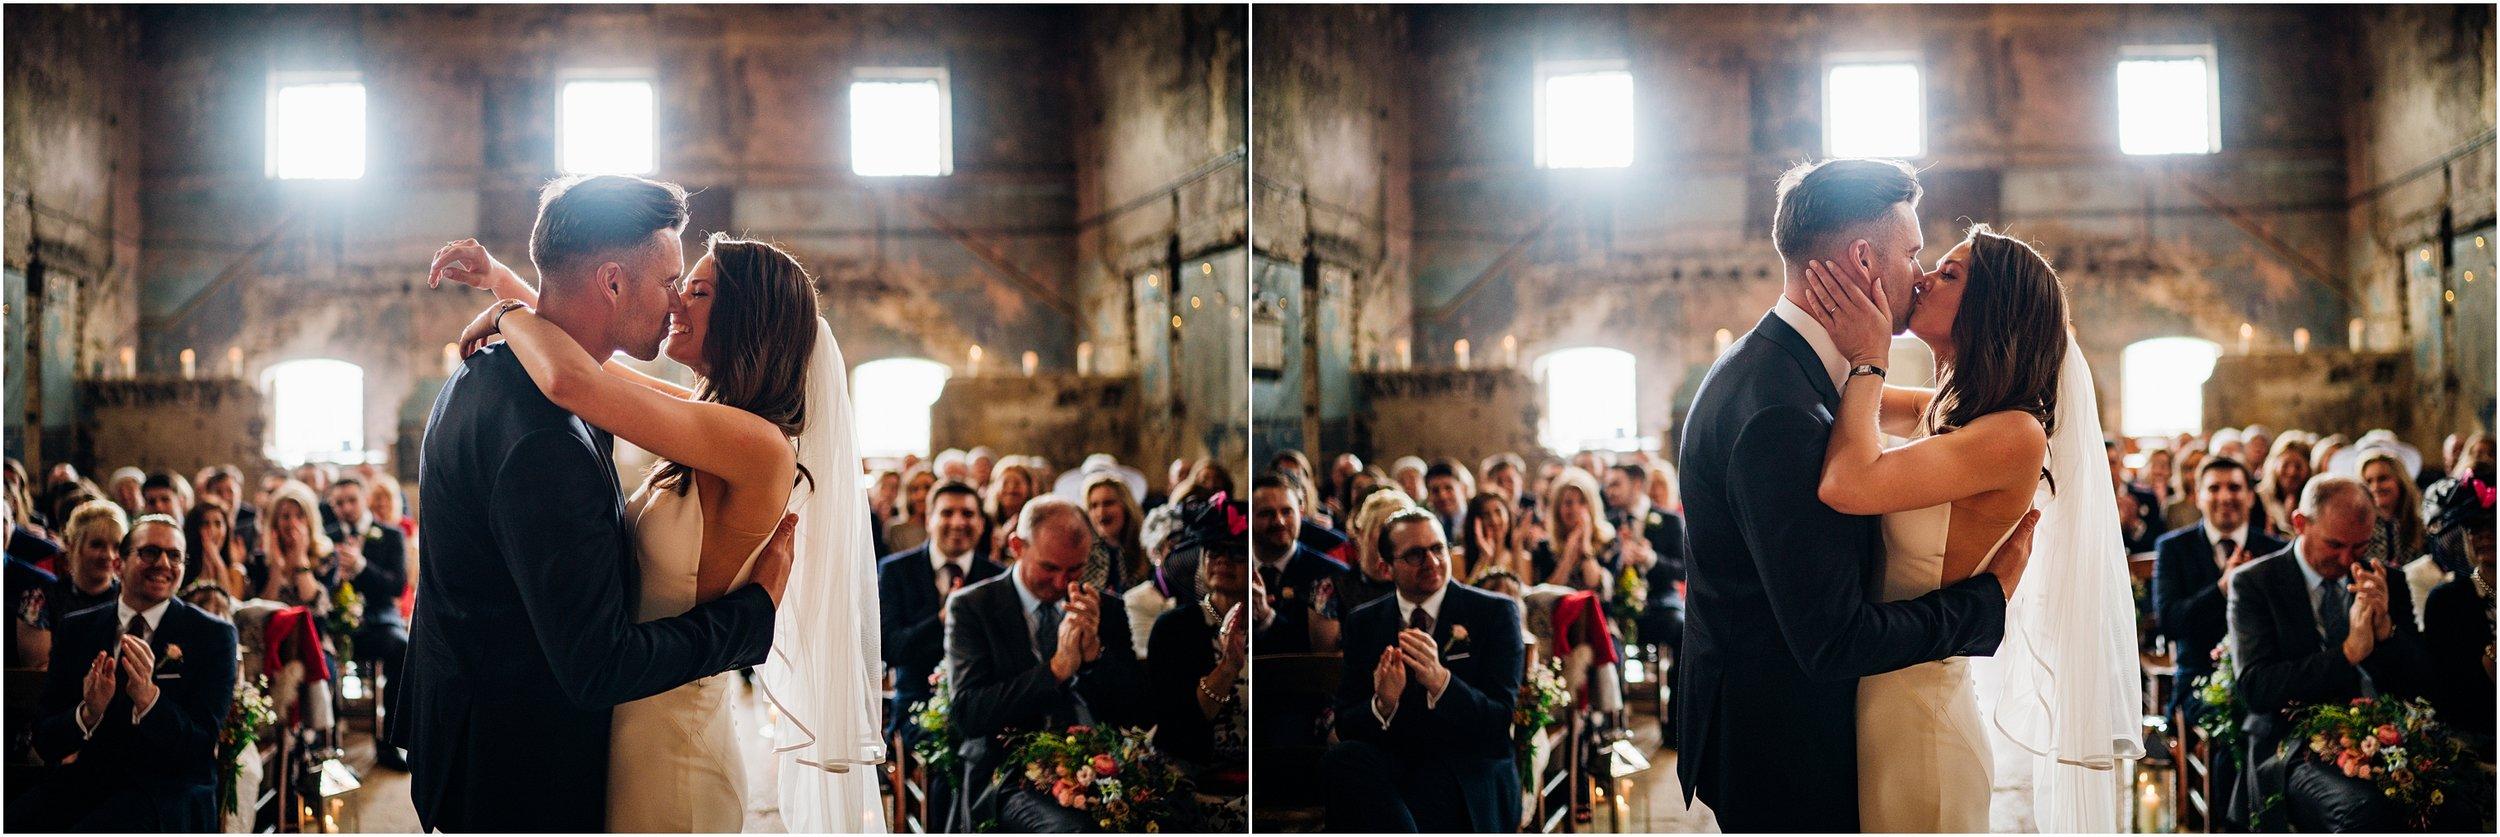 ASYLUM CHAPEL WEDDING LONDON_0023.jpg